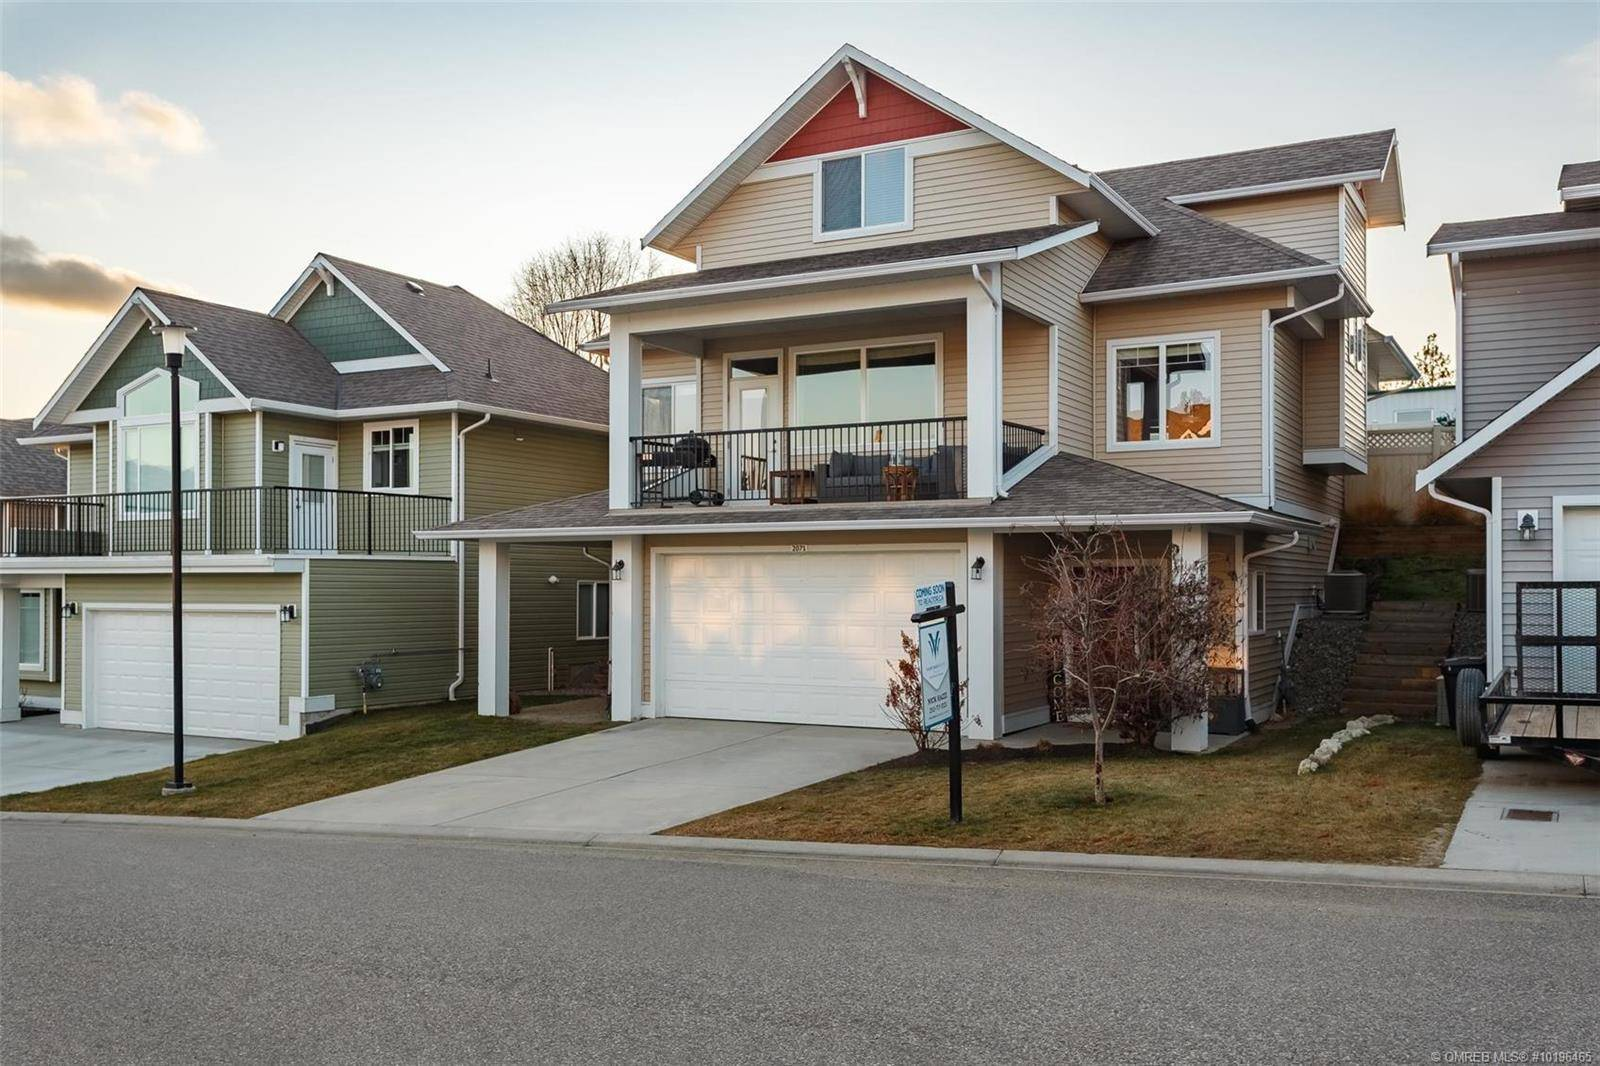 House for sale at 2071 Elkridge Dr West Kelowna British Columbia - MLS: 10196465